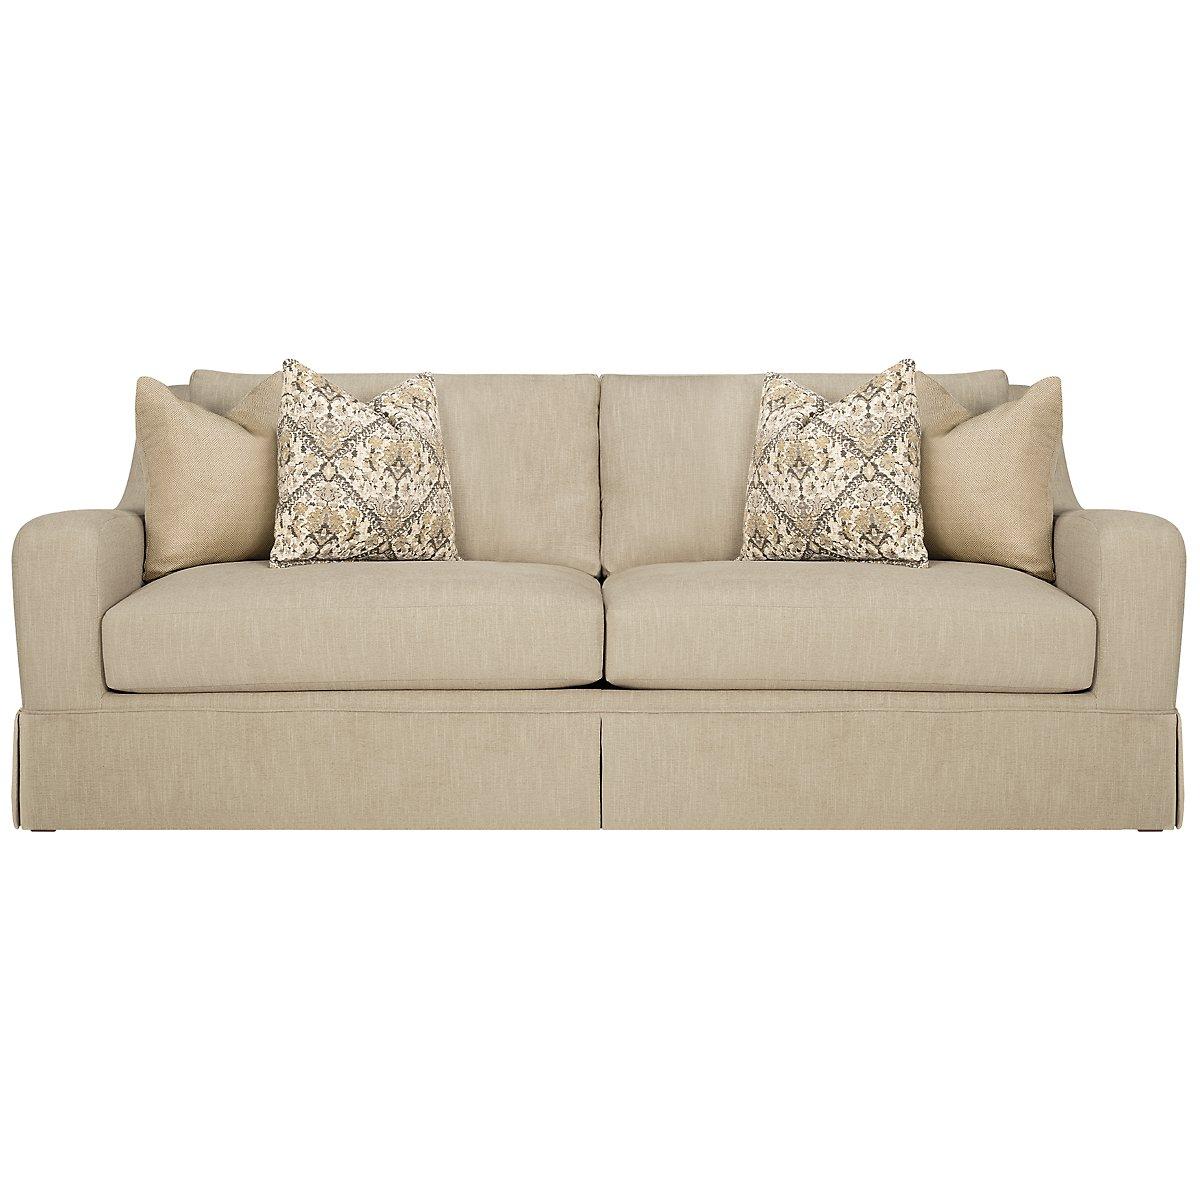 Hallie Beige Fabric Sofa